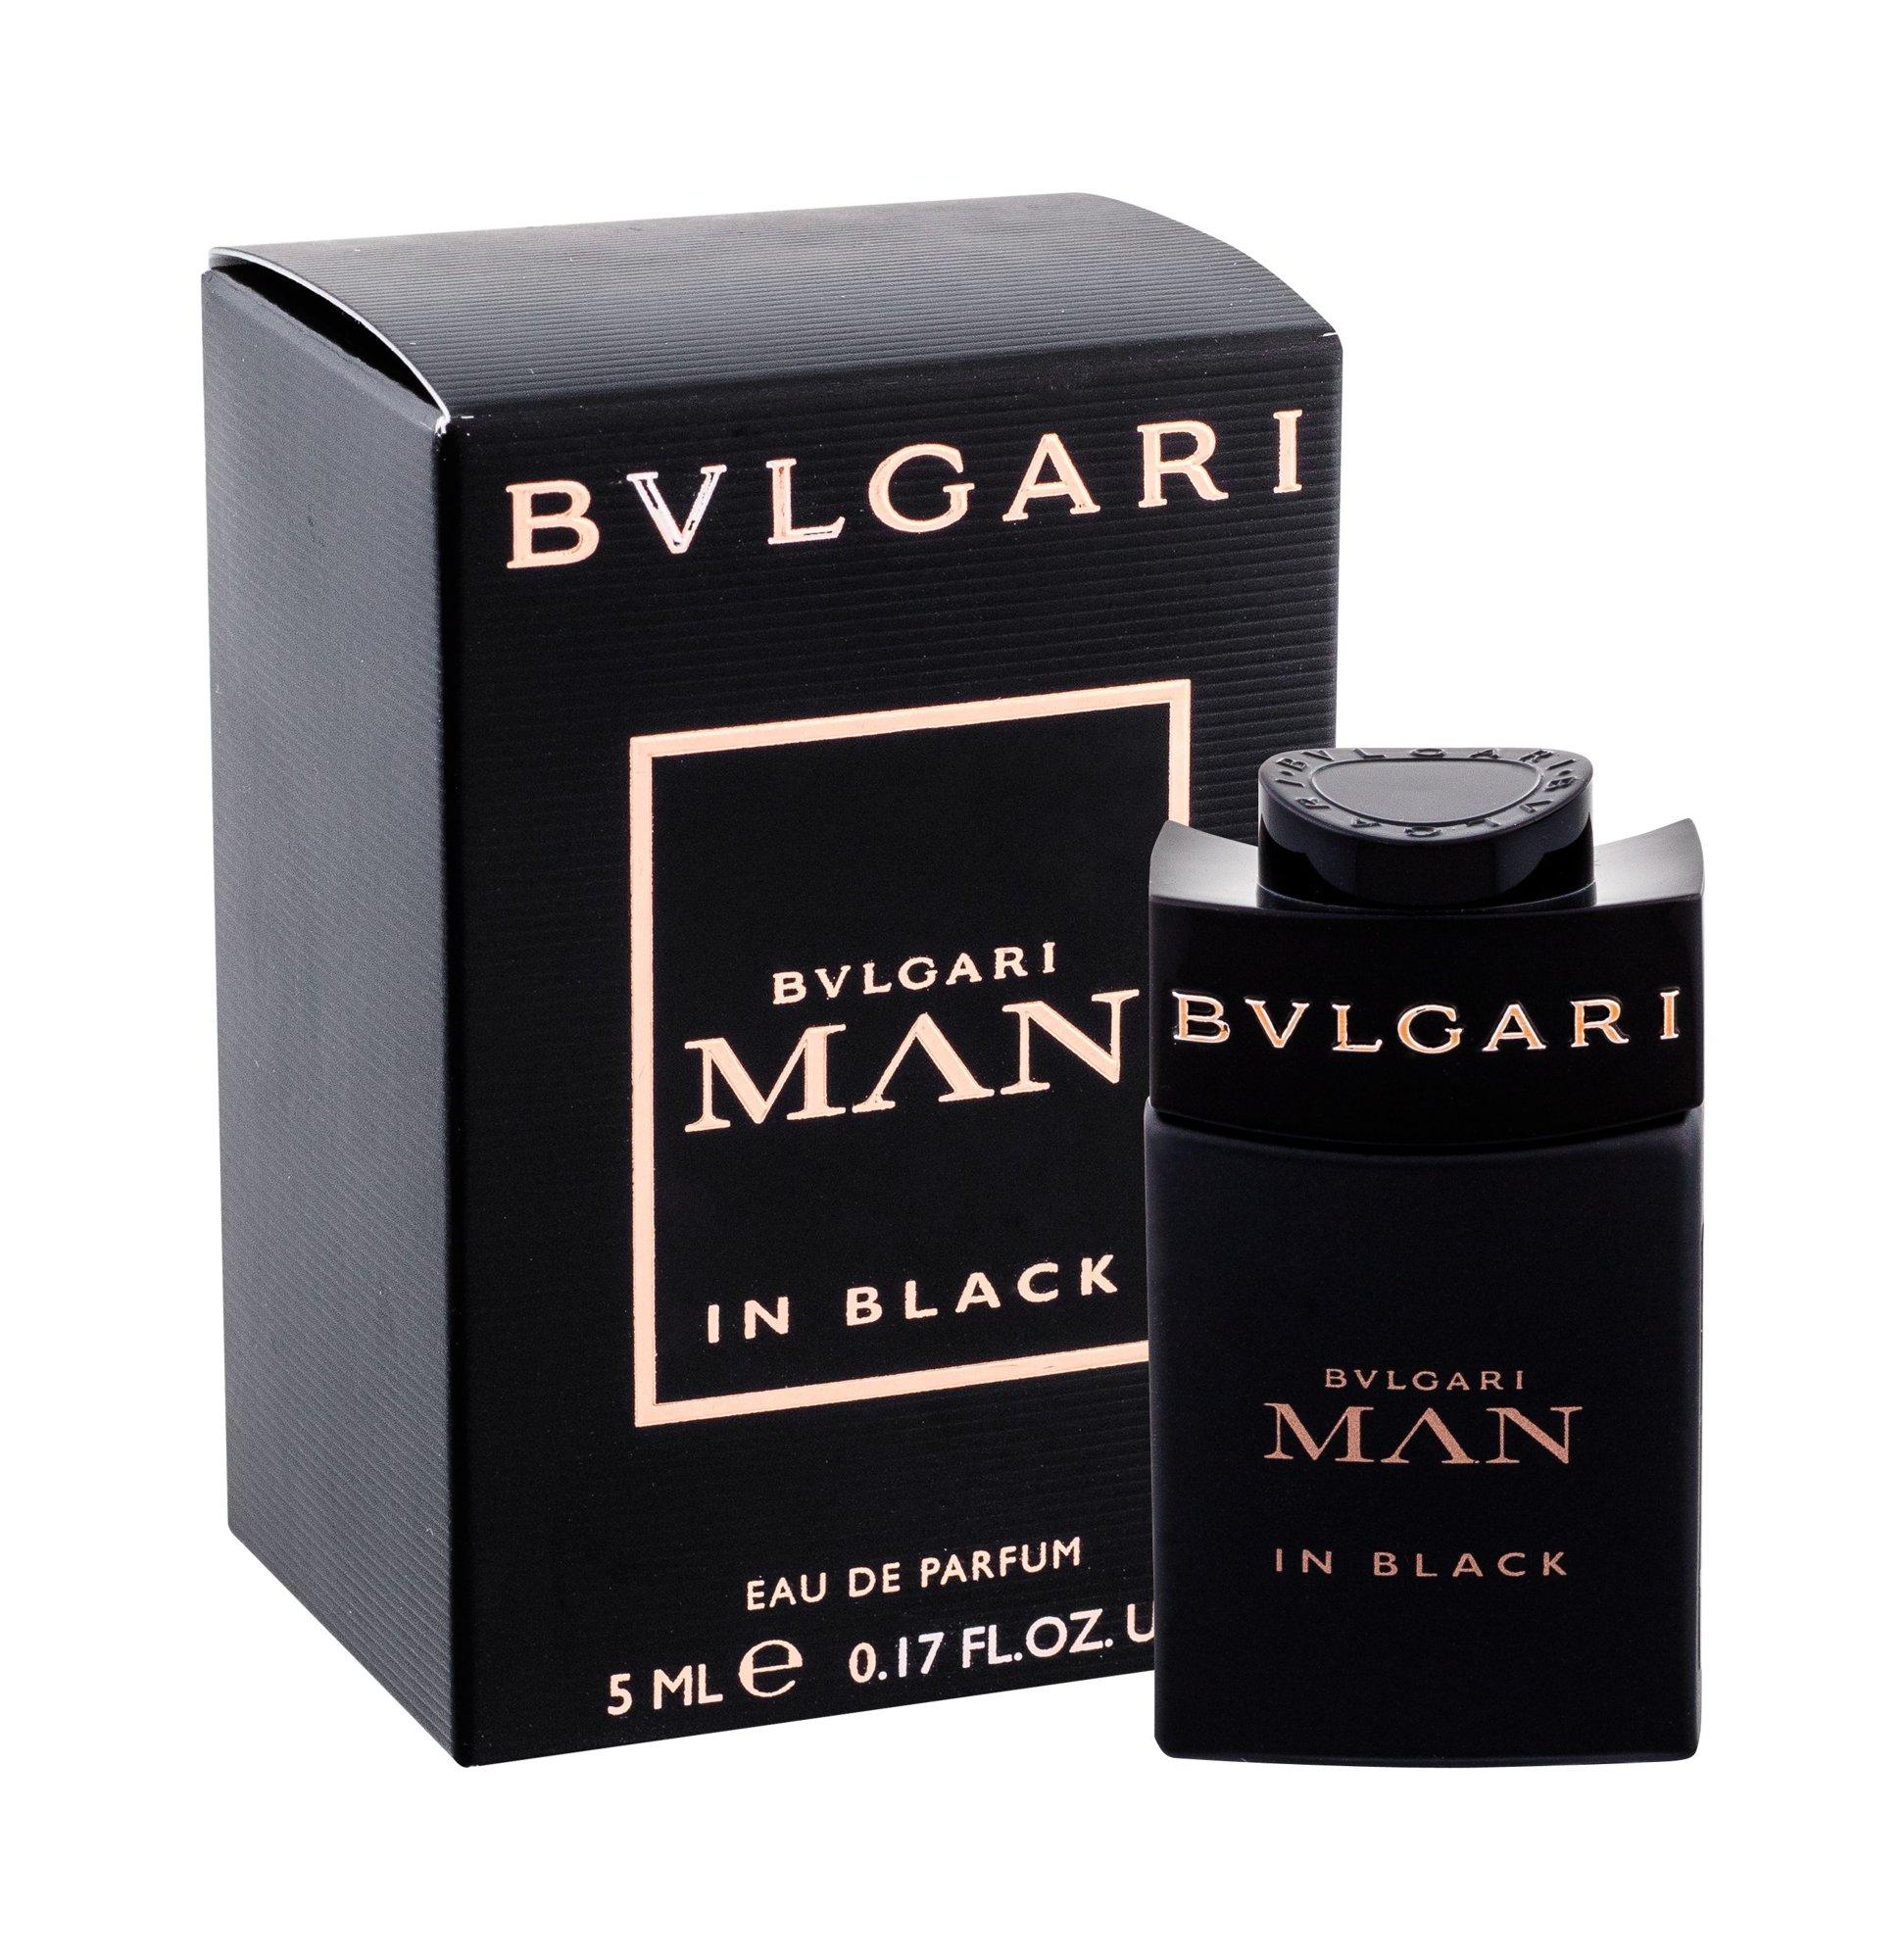 Bvlgari Man In Black Eau de Parfum 5ml